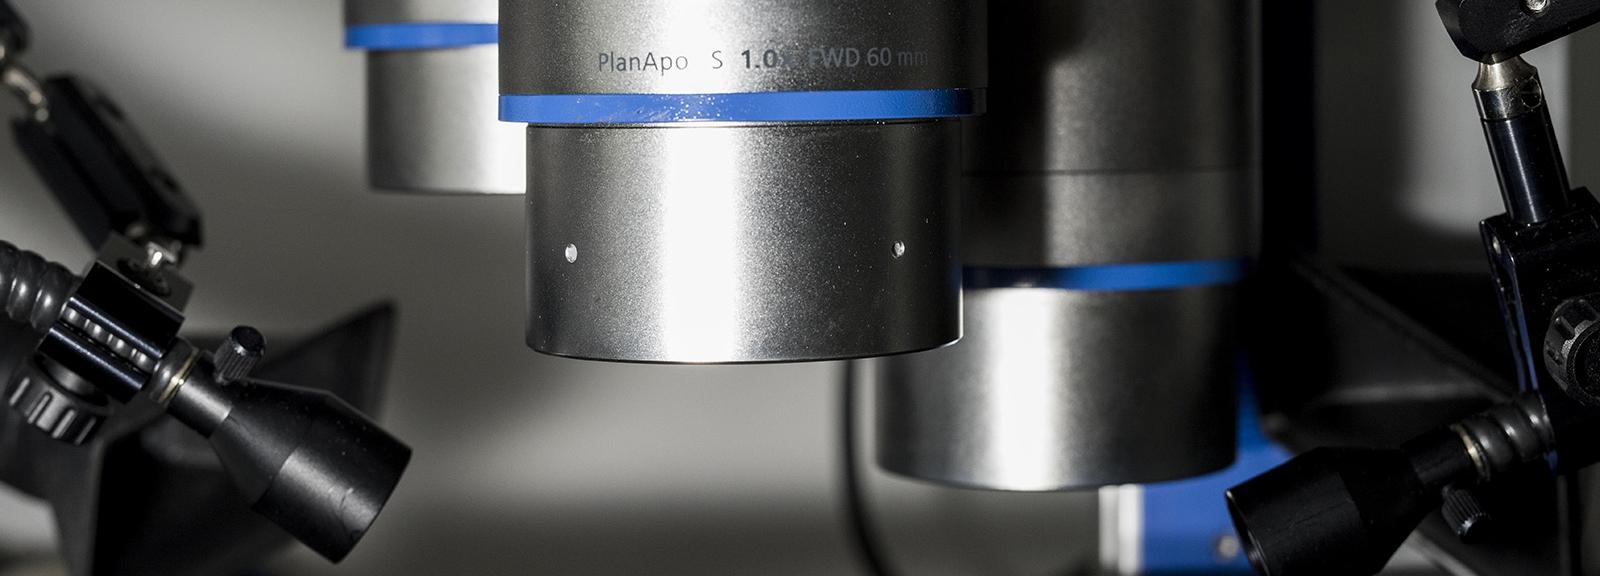 Stereoscopic microscope - Concarneau Marine Station © MNHN - Agnès Iatzoura